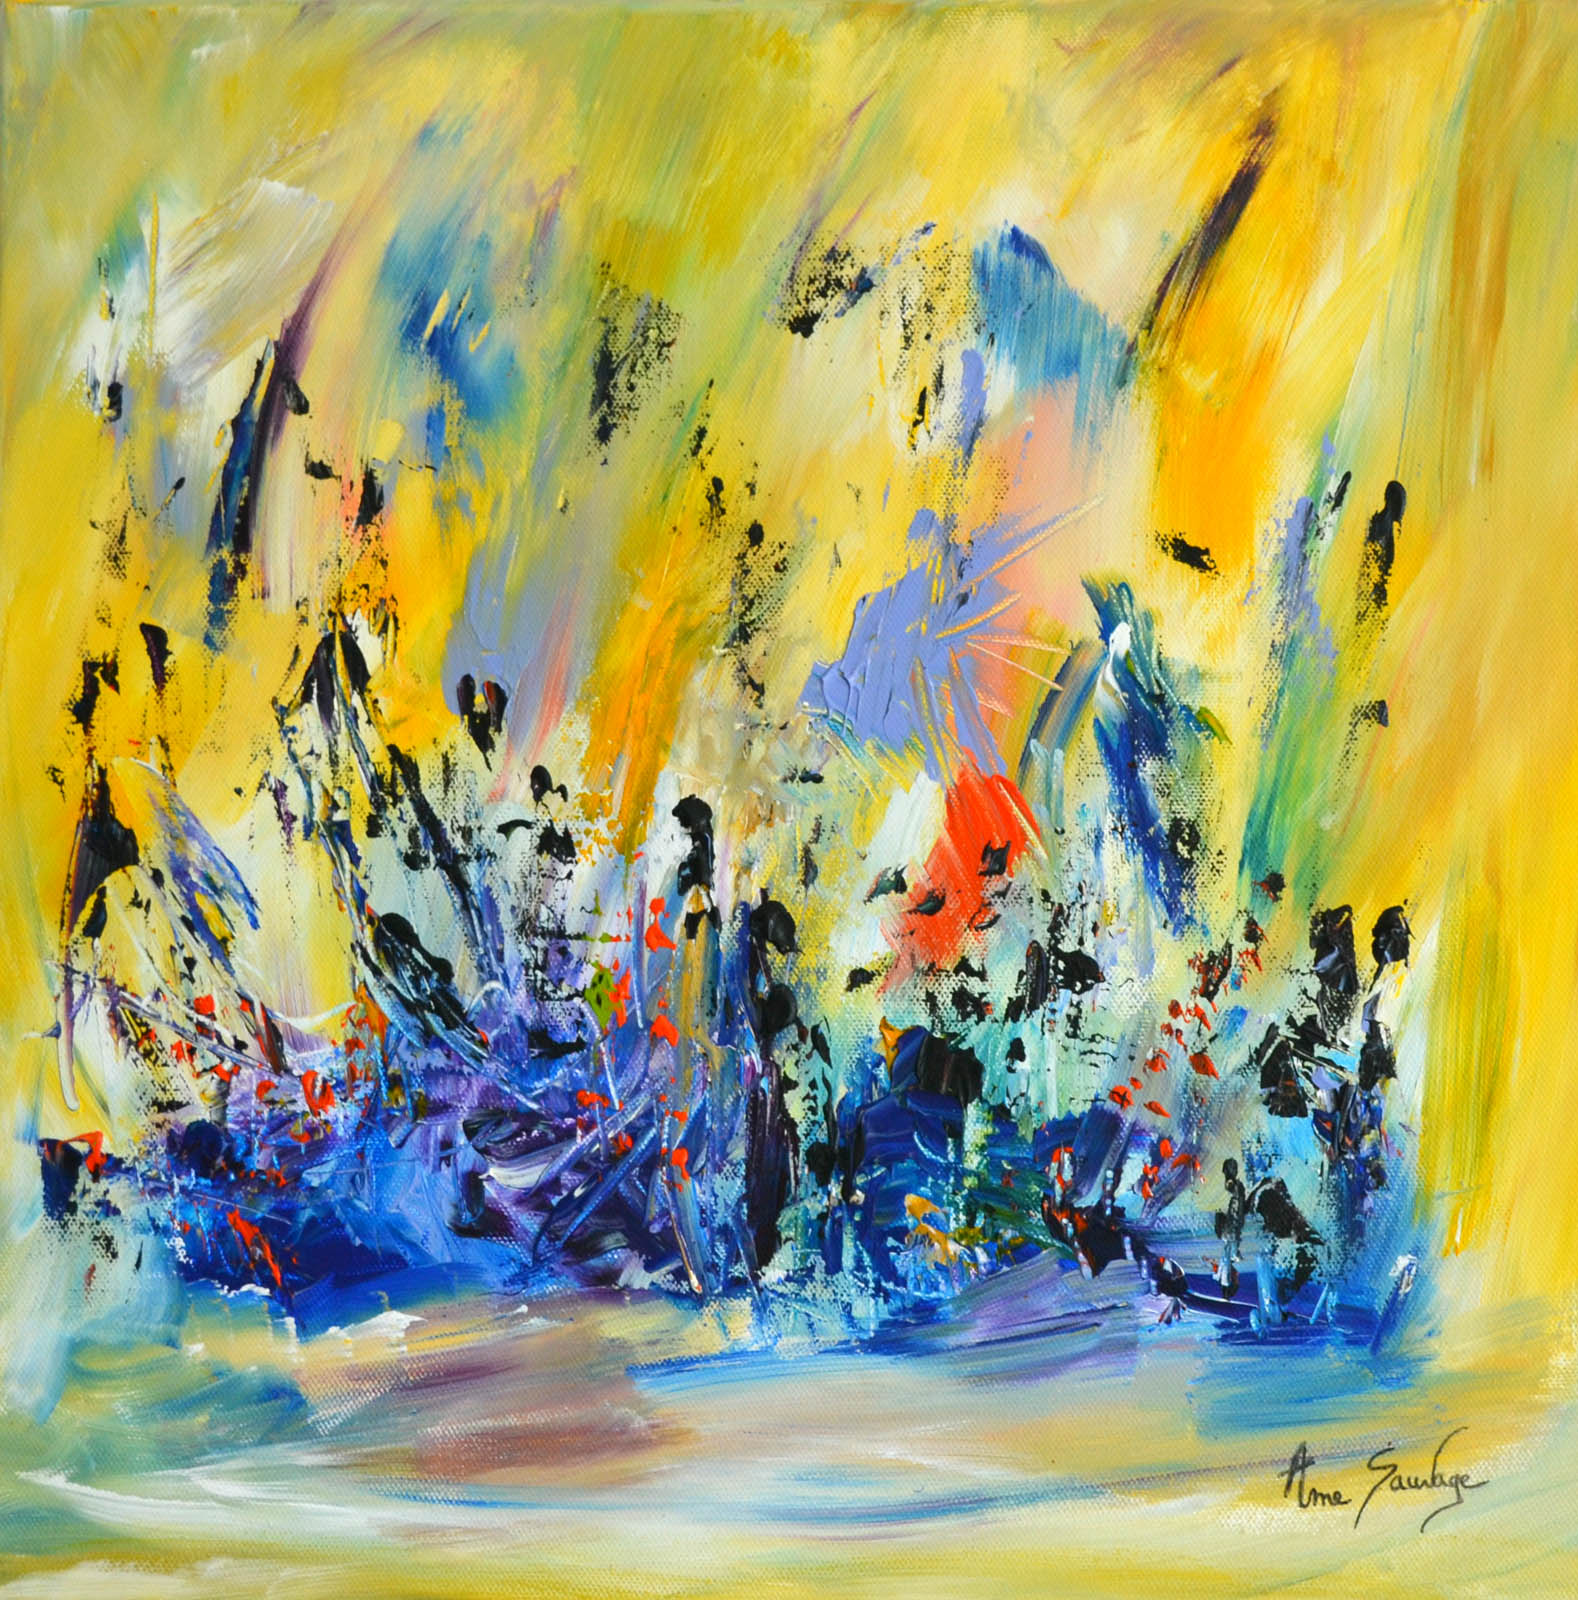 tableau jaune abstrait